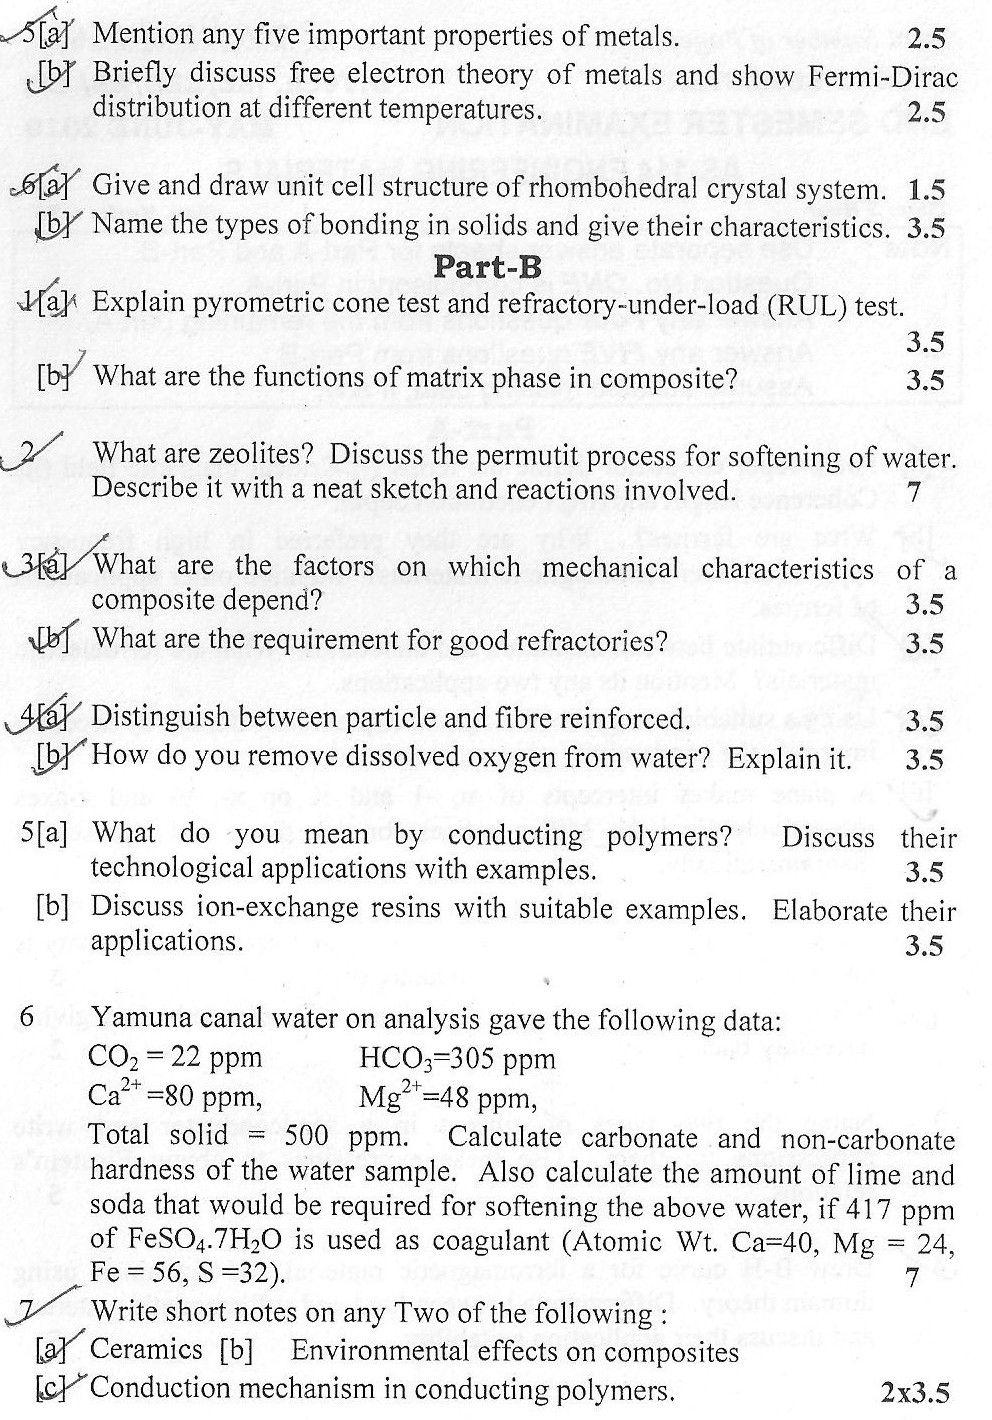 DTU Question Papers 2010 – 2 Semester - End Sem - AS-114